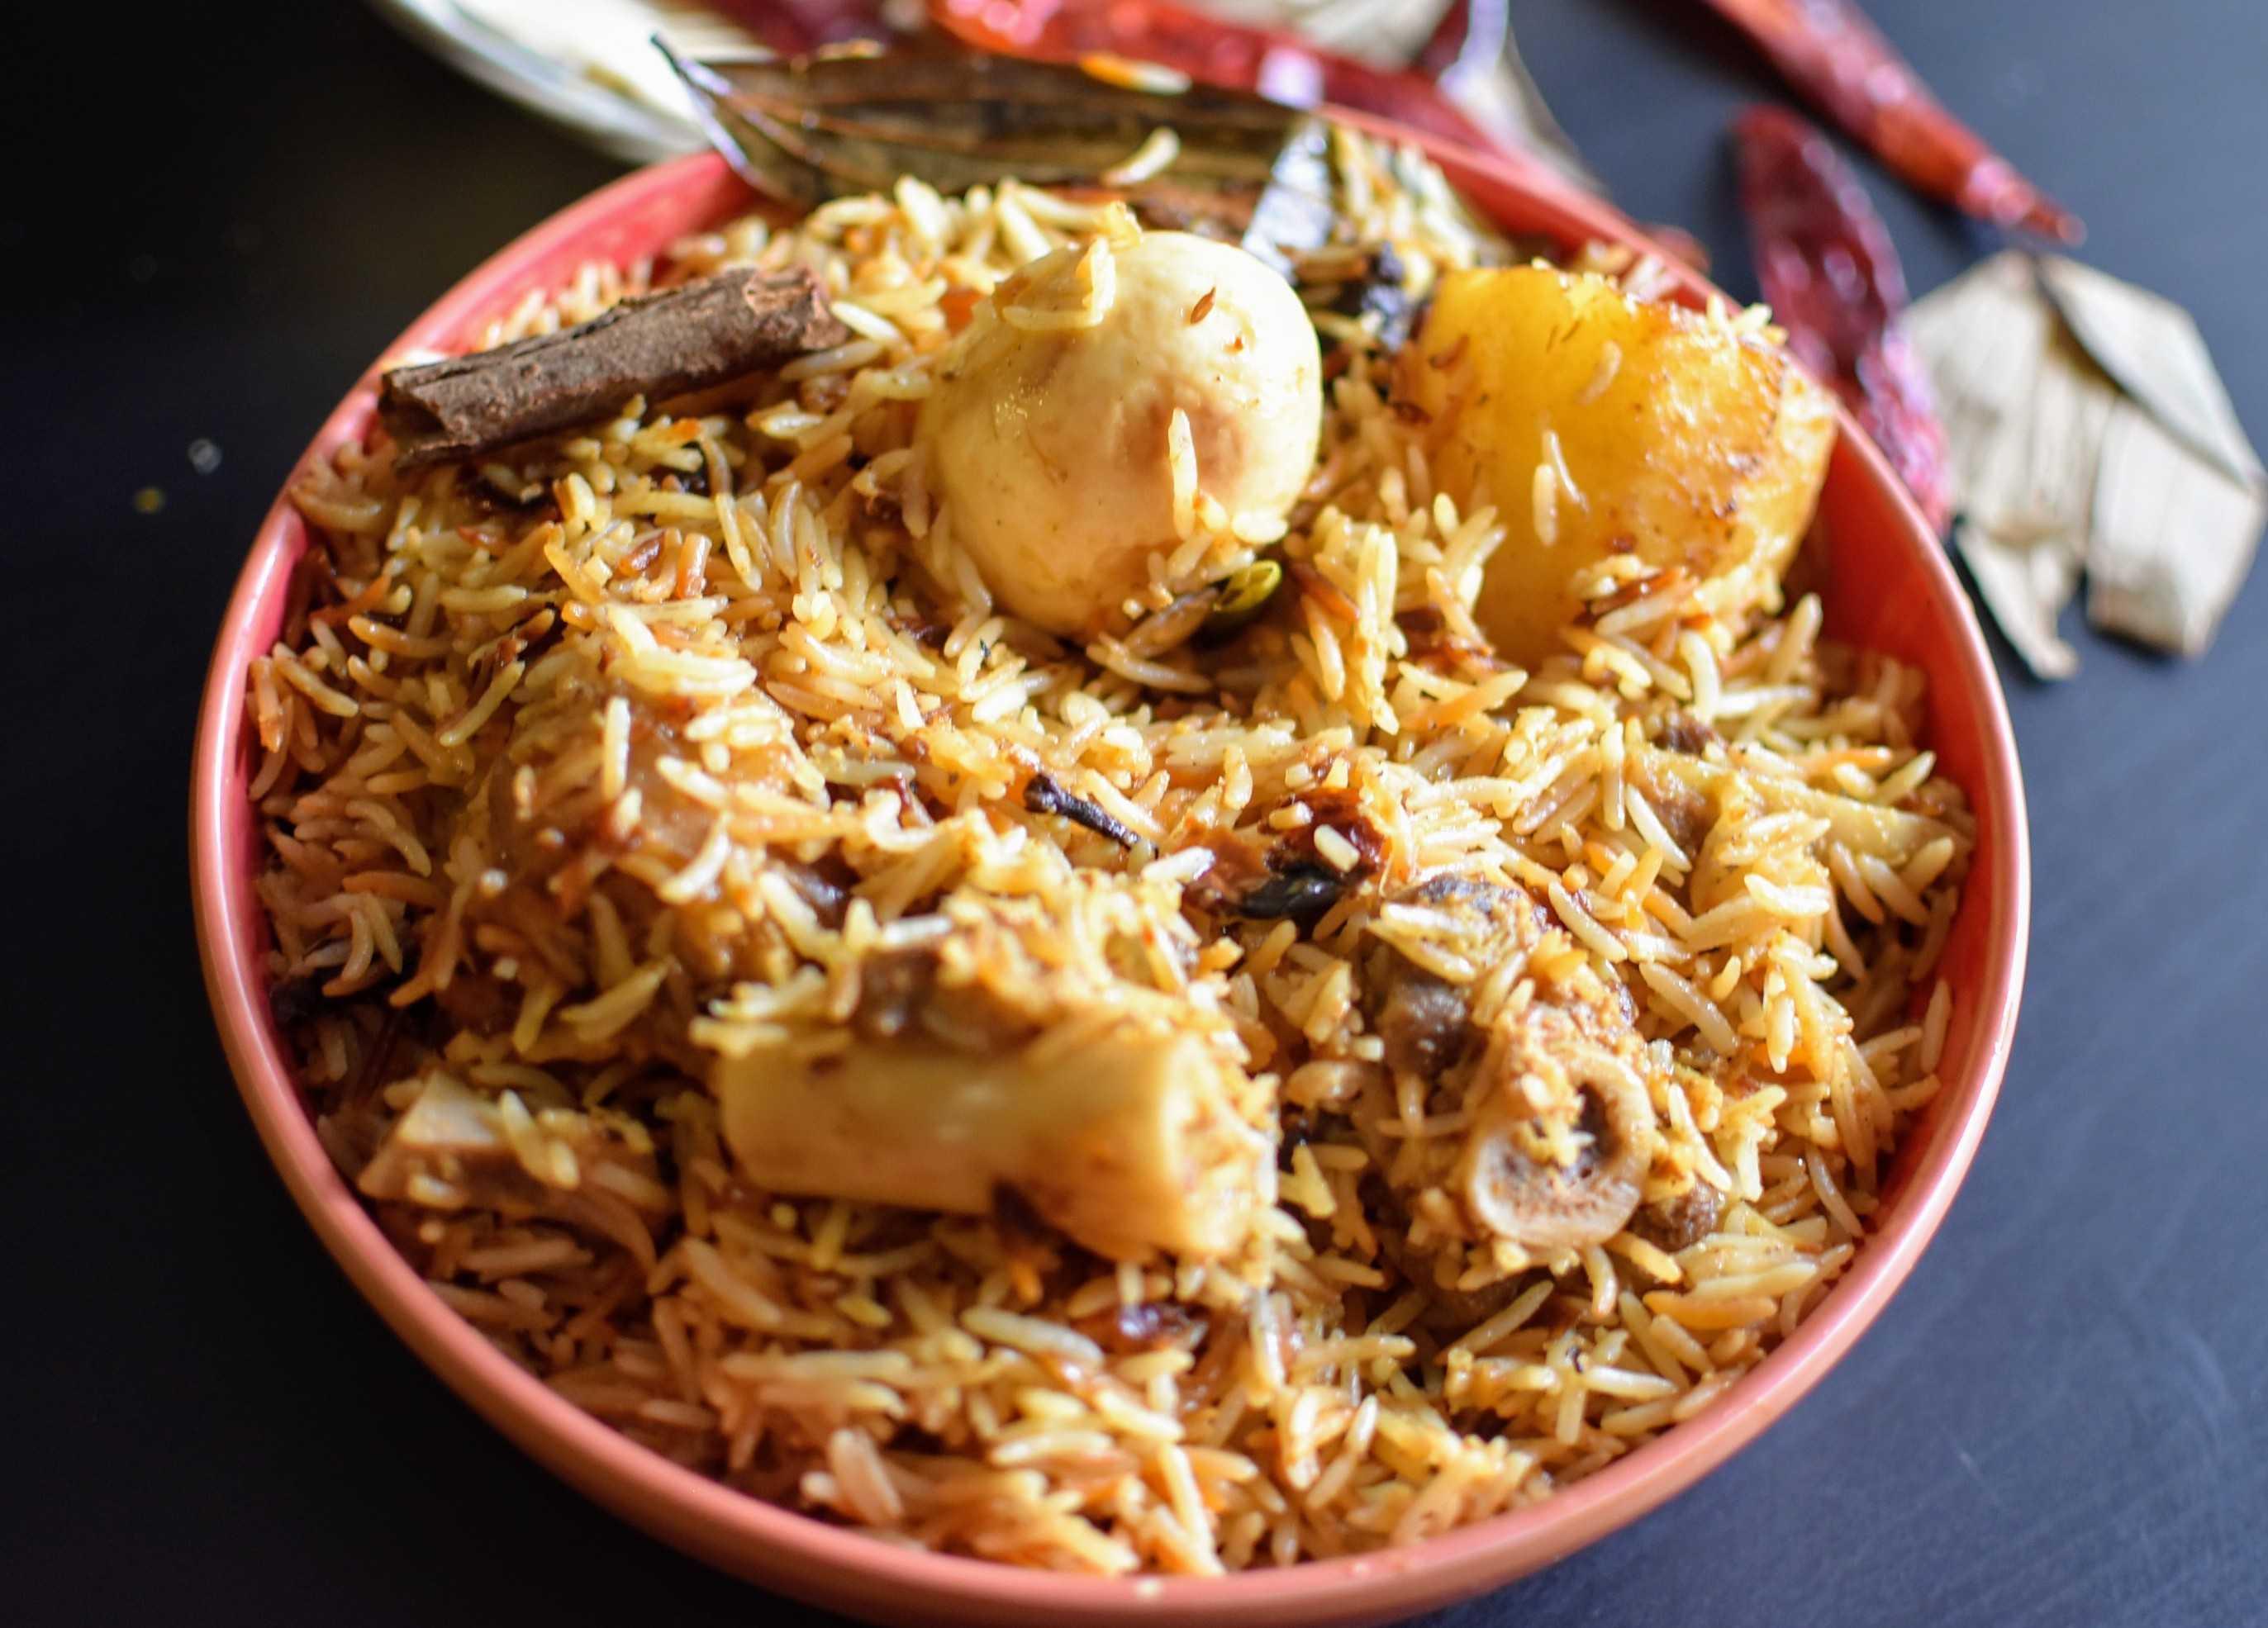 Kolkata Style Goat Meat Biryani